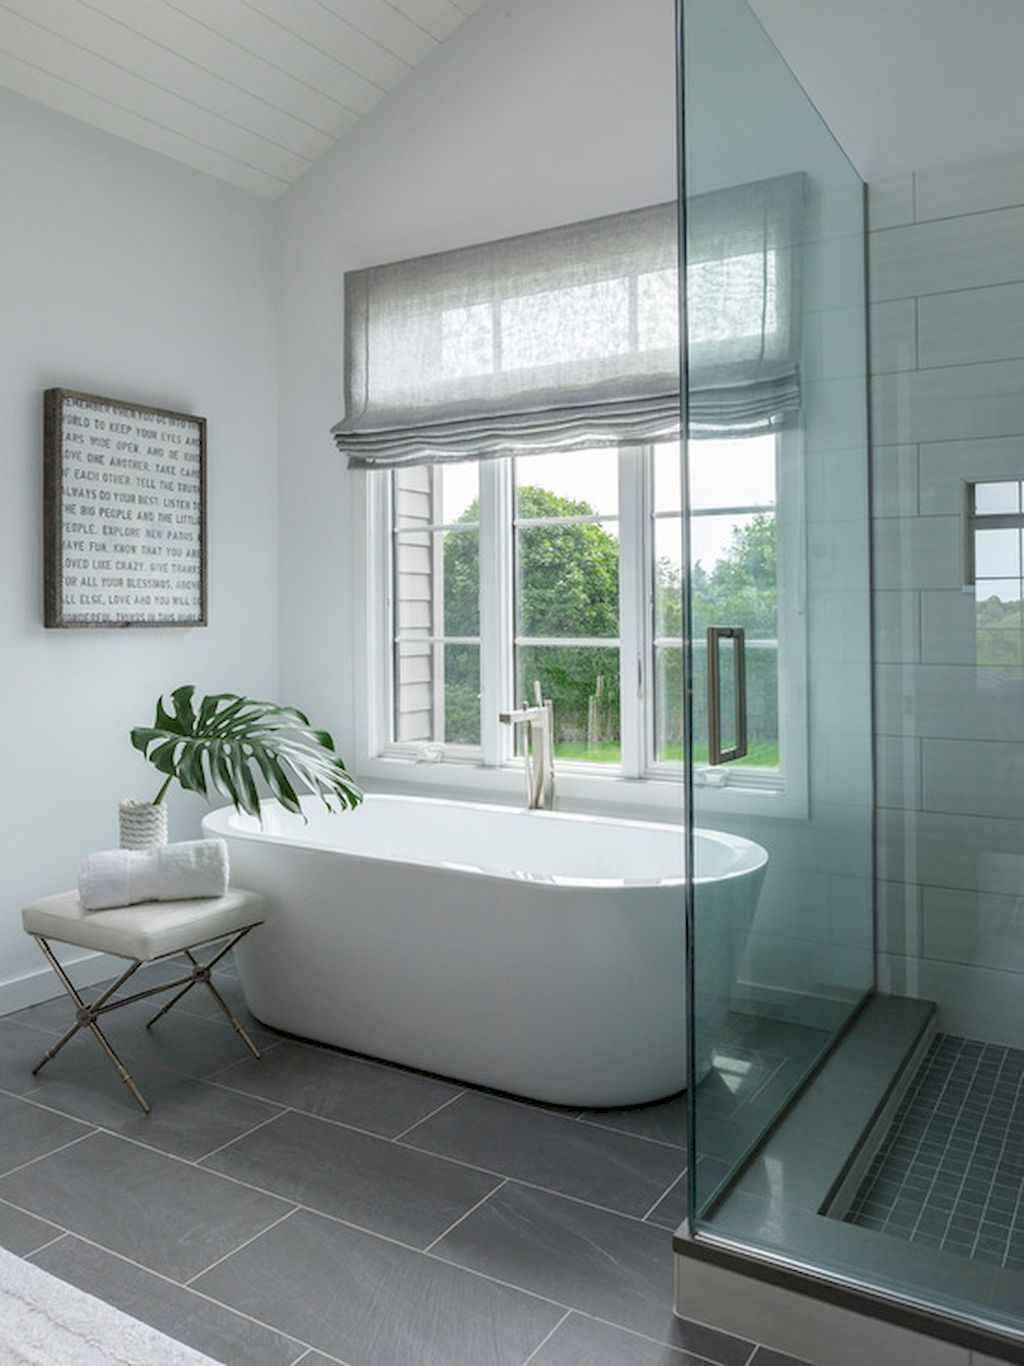 Inspiring apartment bathroom remodel ideas on a budget (40)